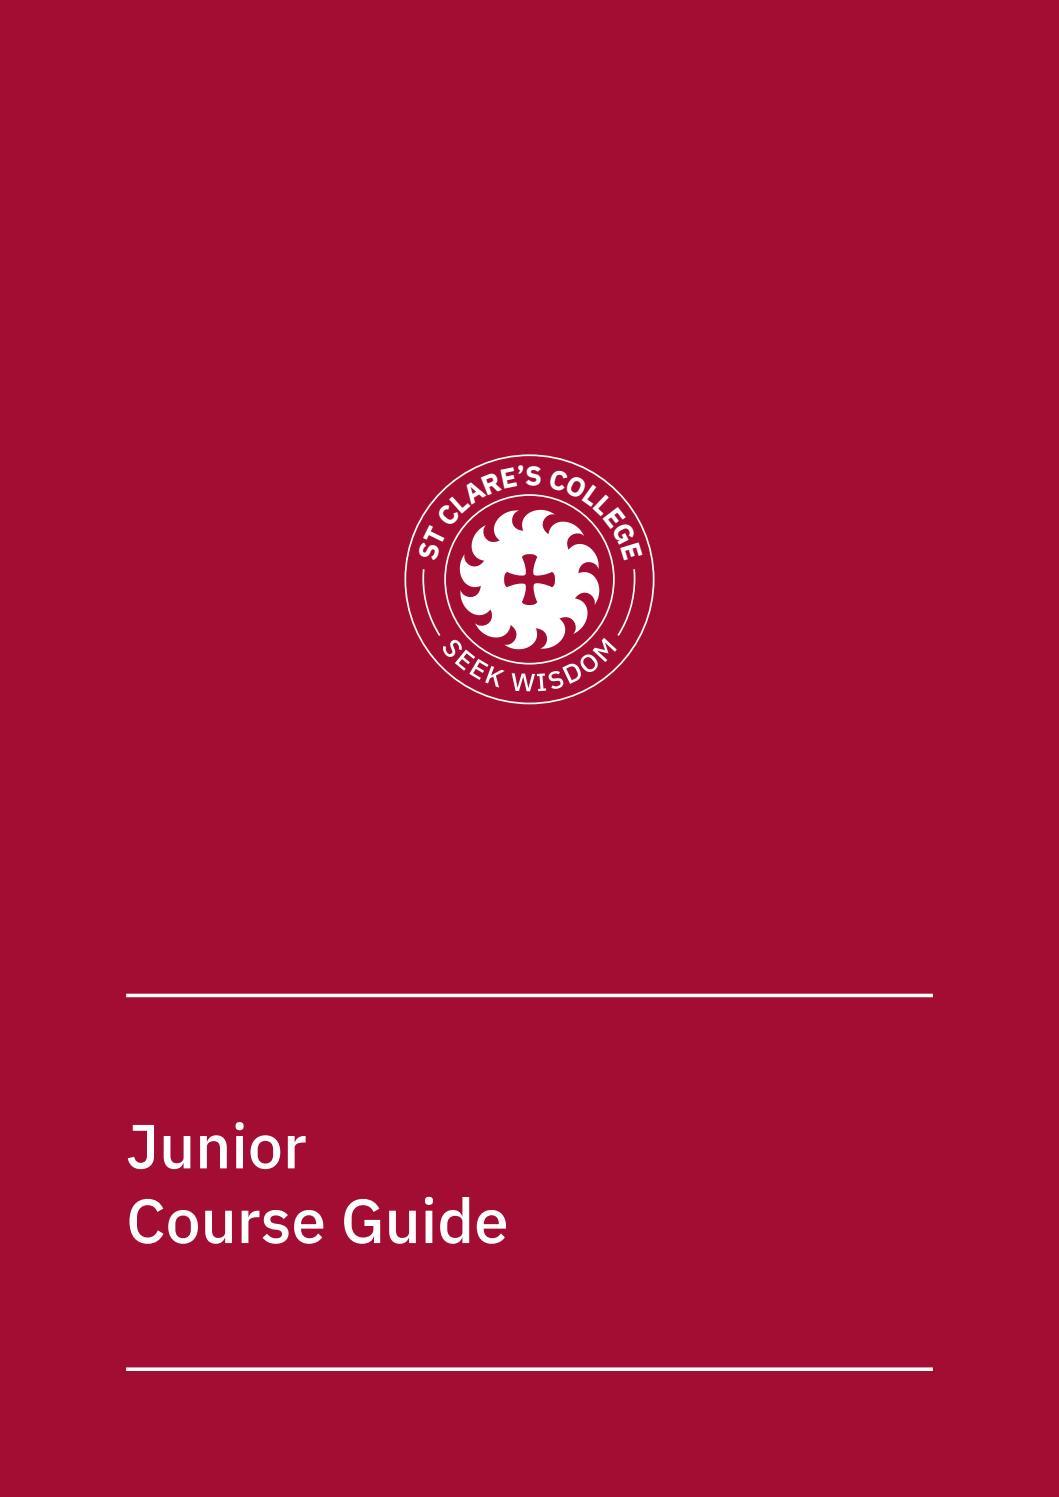 Junior Course Guide